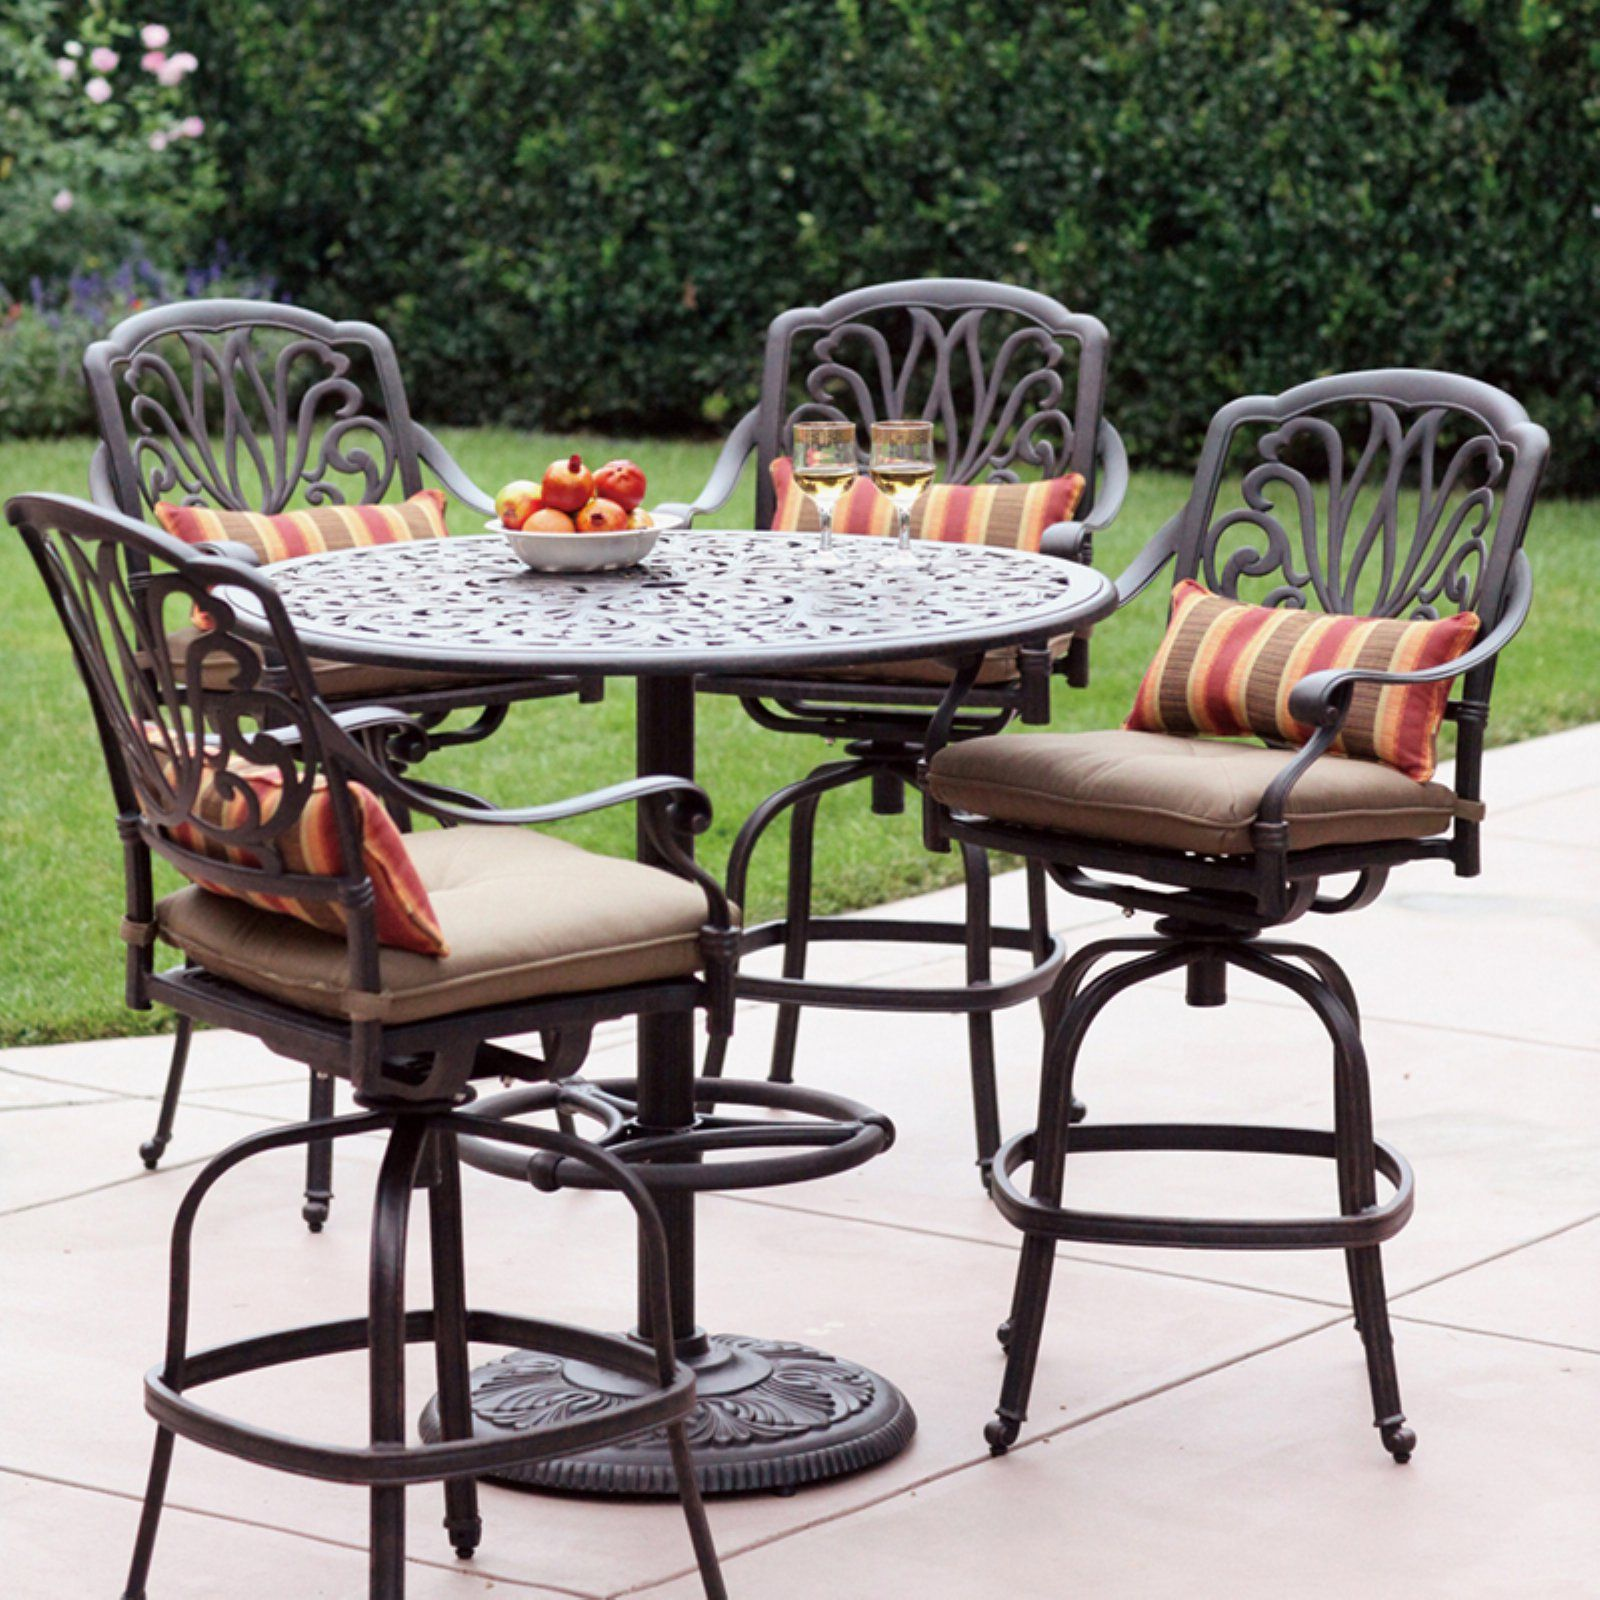 Outdoor Darlee Elizabeth 5 Piece Floral Aluminum Bar Height Patio Dining Set Outdoor Patio Bar Patio Furniture Sets Bar Height Patio Furniture